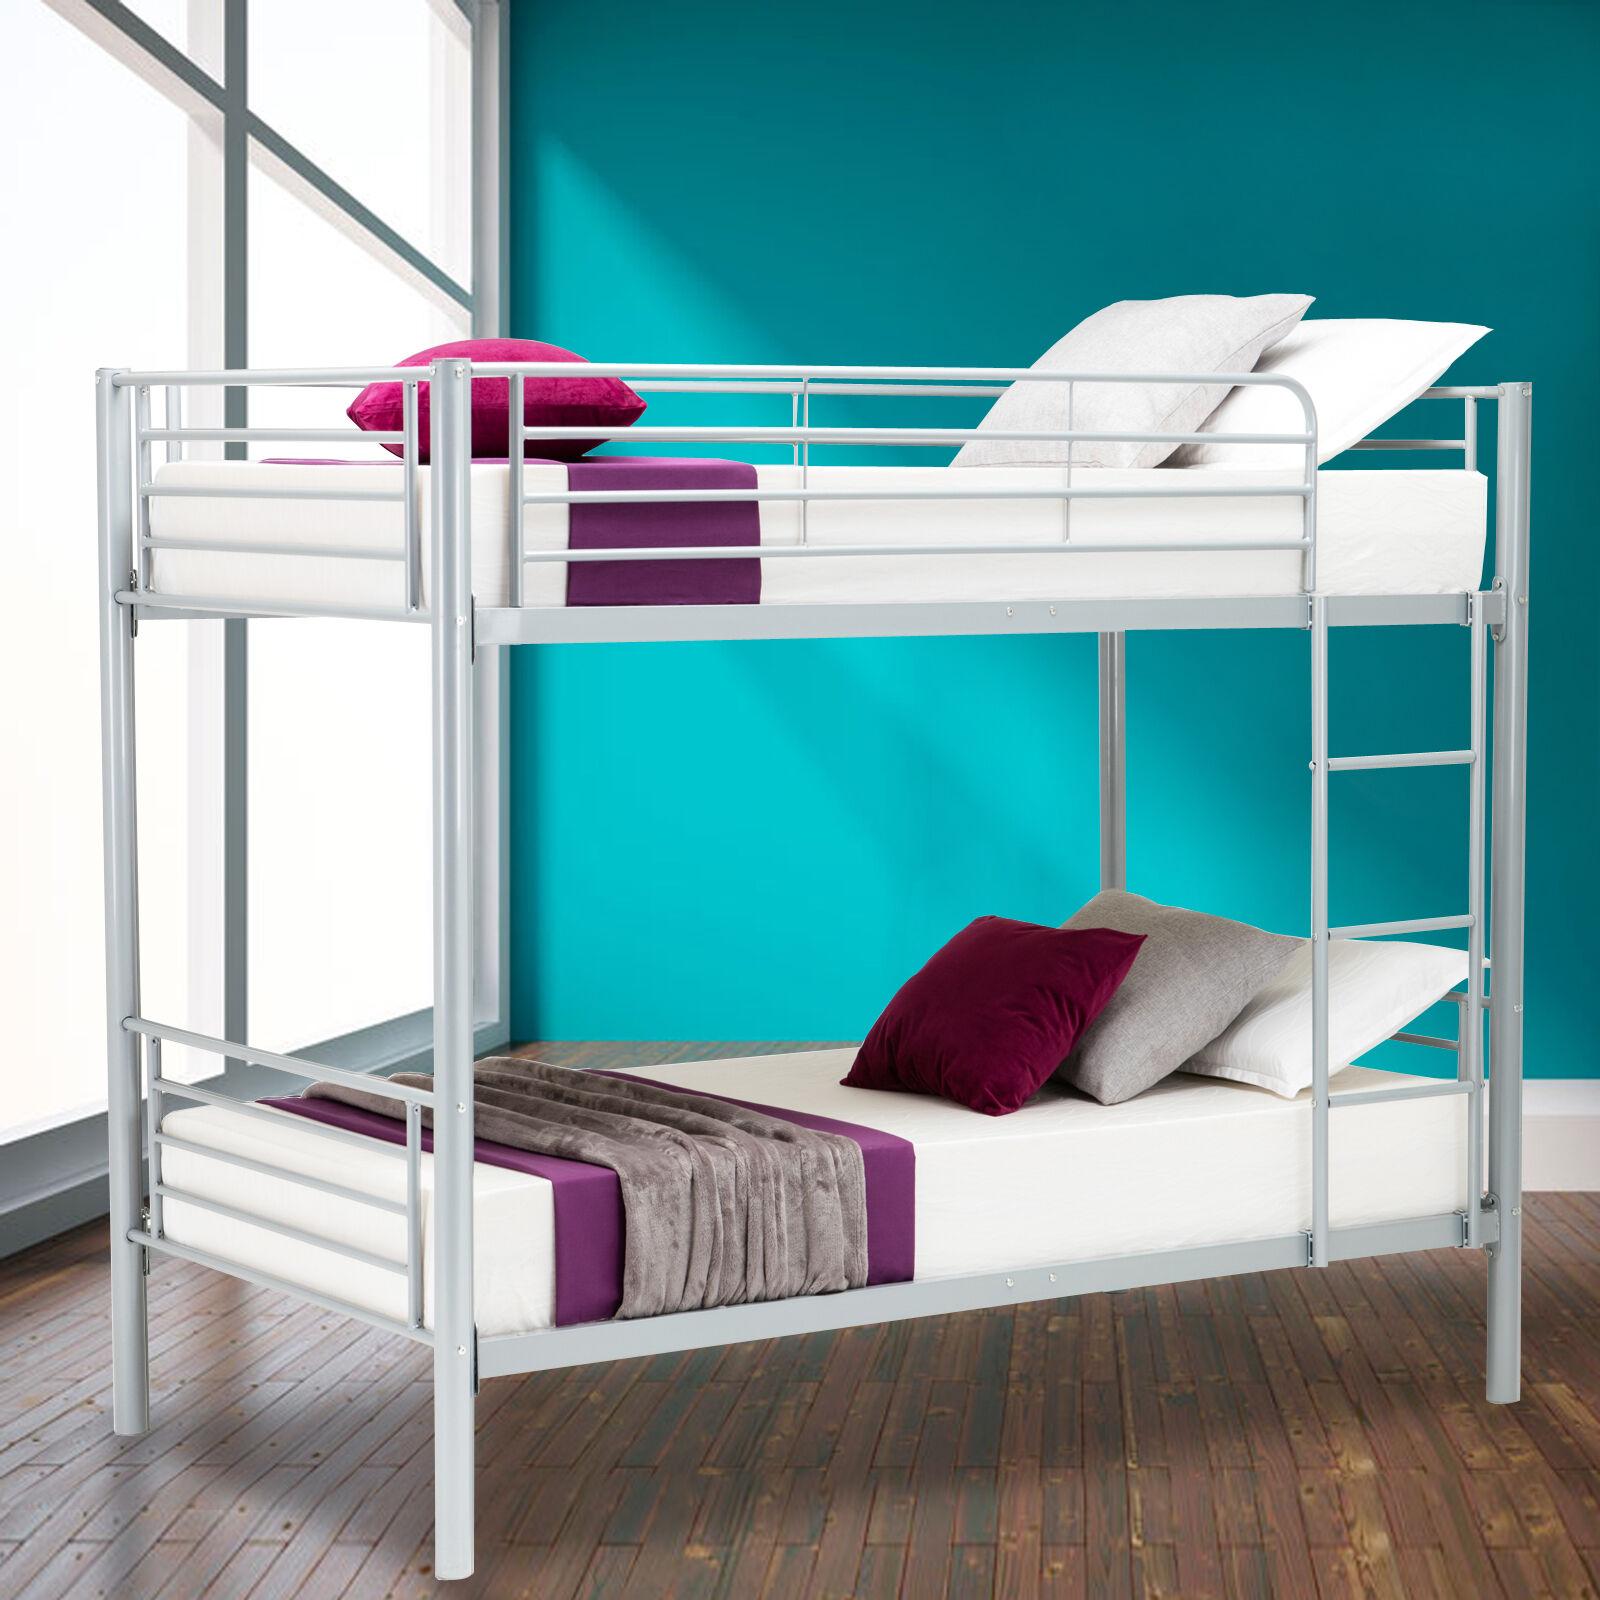 metal twin over twin bunk beds frame ladder kids adult children bedroom dorm